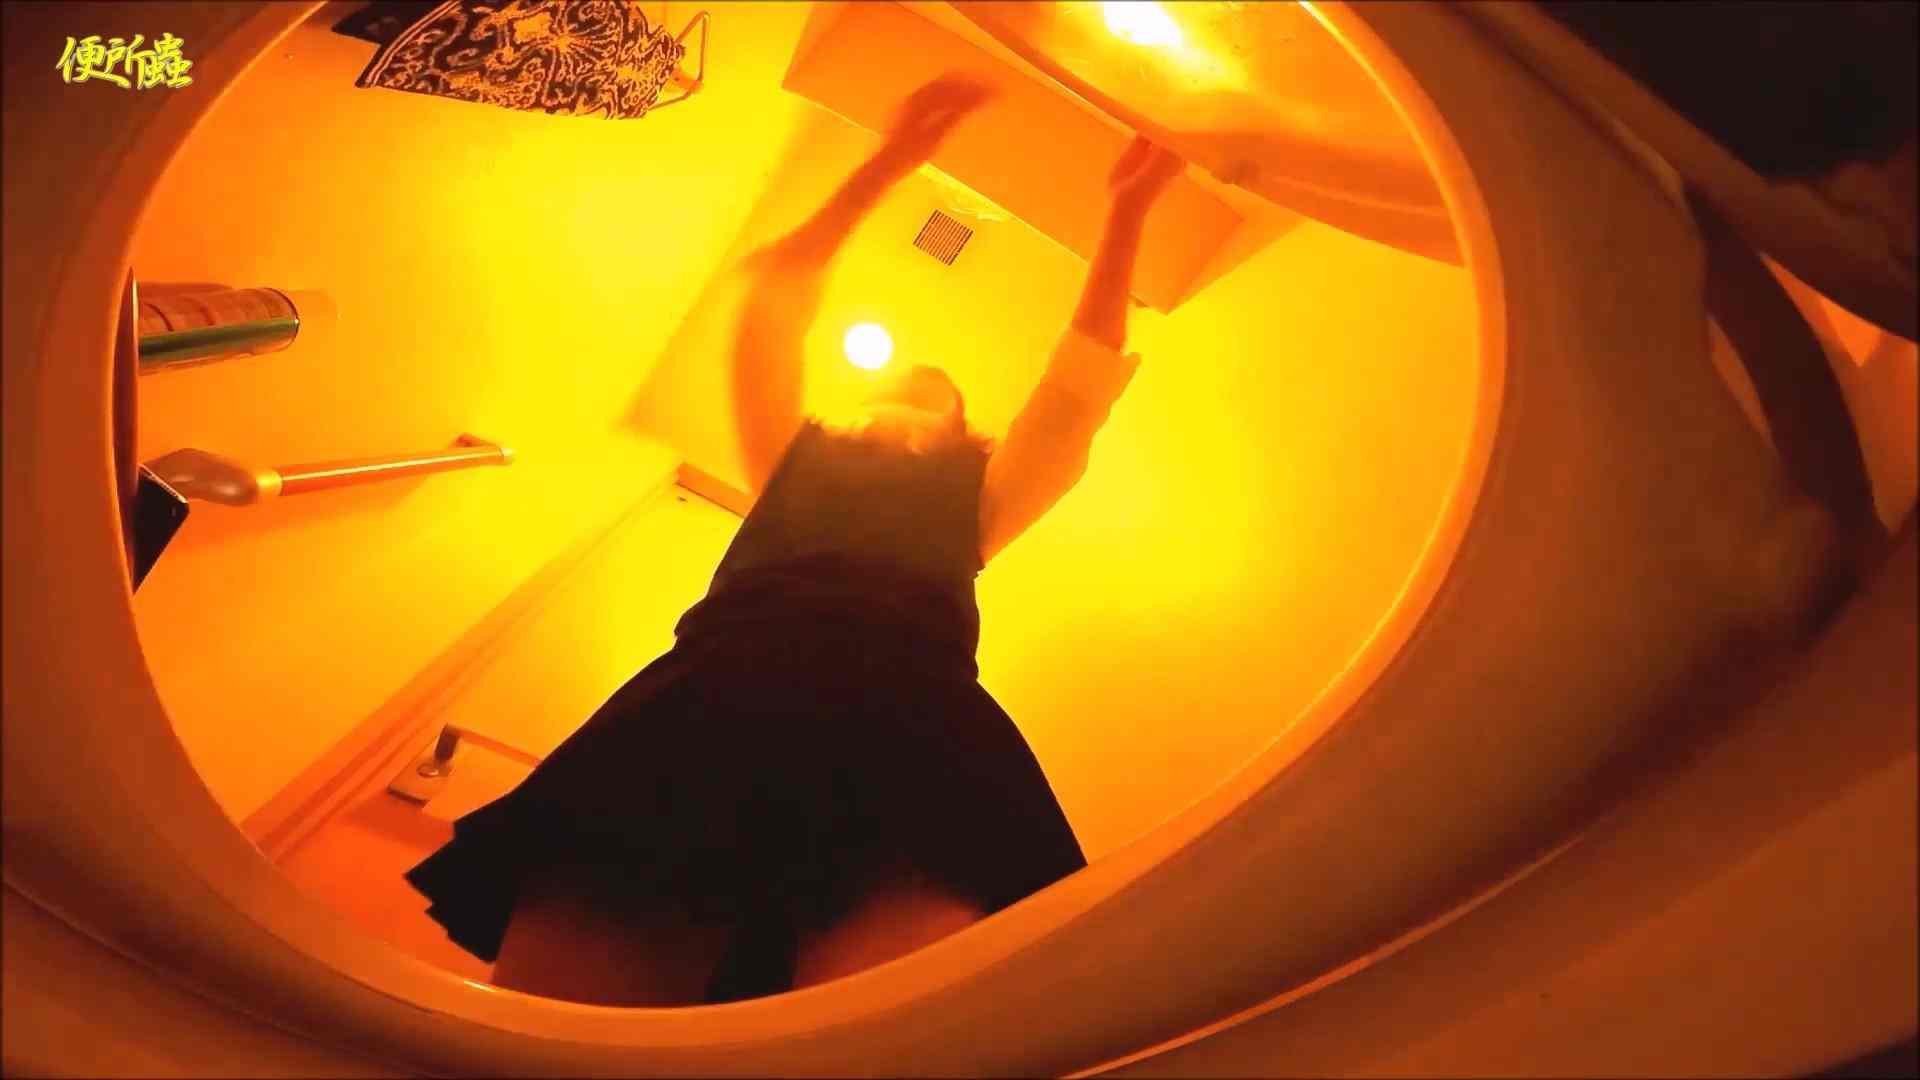 vol.08 便所蟲さんのリターン~寺子屋洗面所盗撮~ 高画質動画   盛合せ  72画像 17